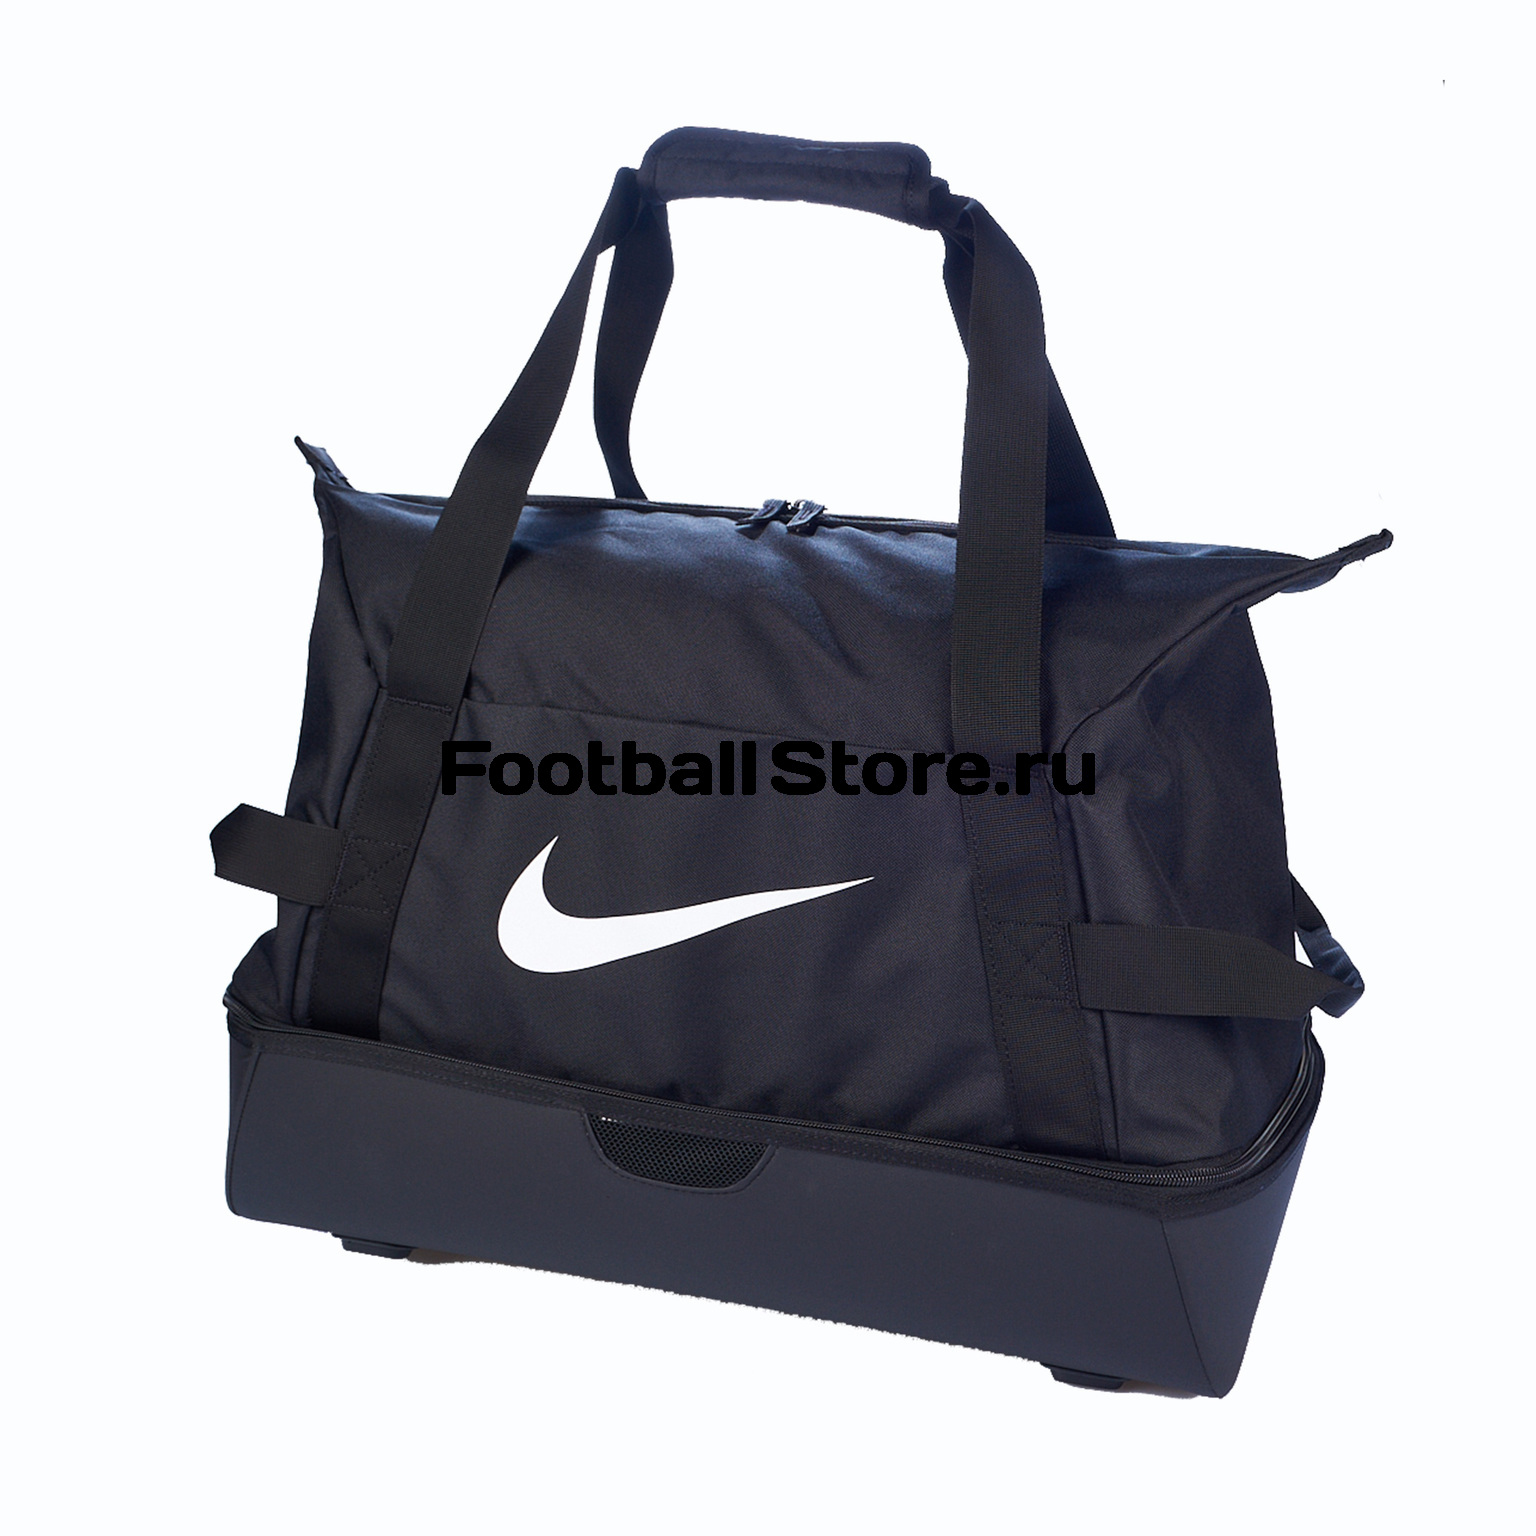 be4dc26fbe13 Сумка Nike Academy Team L HDCS BA5506-010 – купить в интернет магазине  footballstore, цена, фото